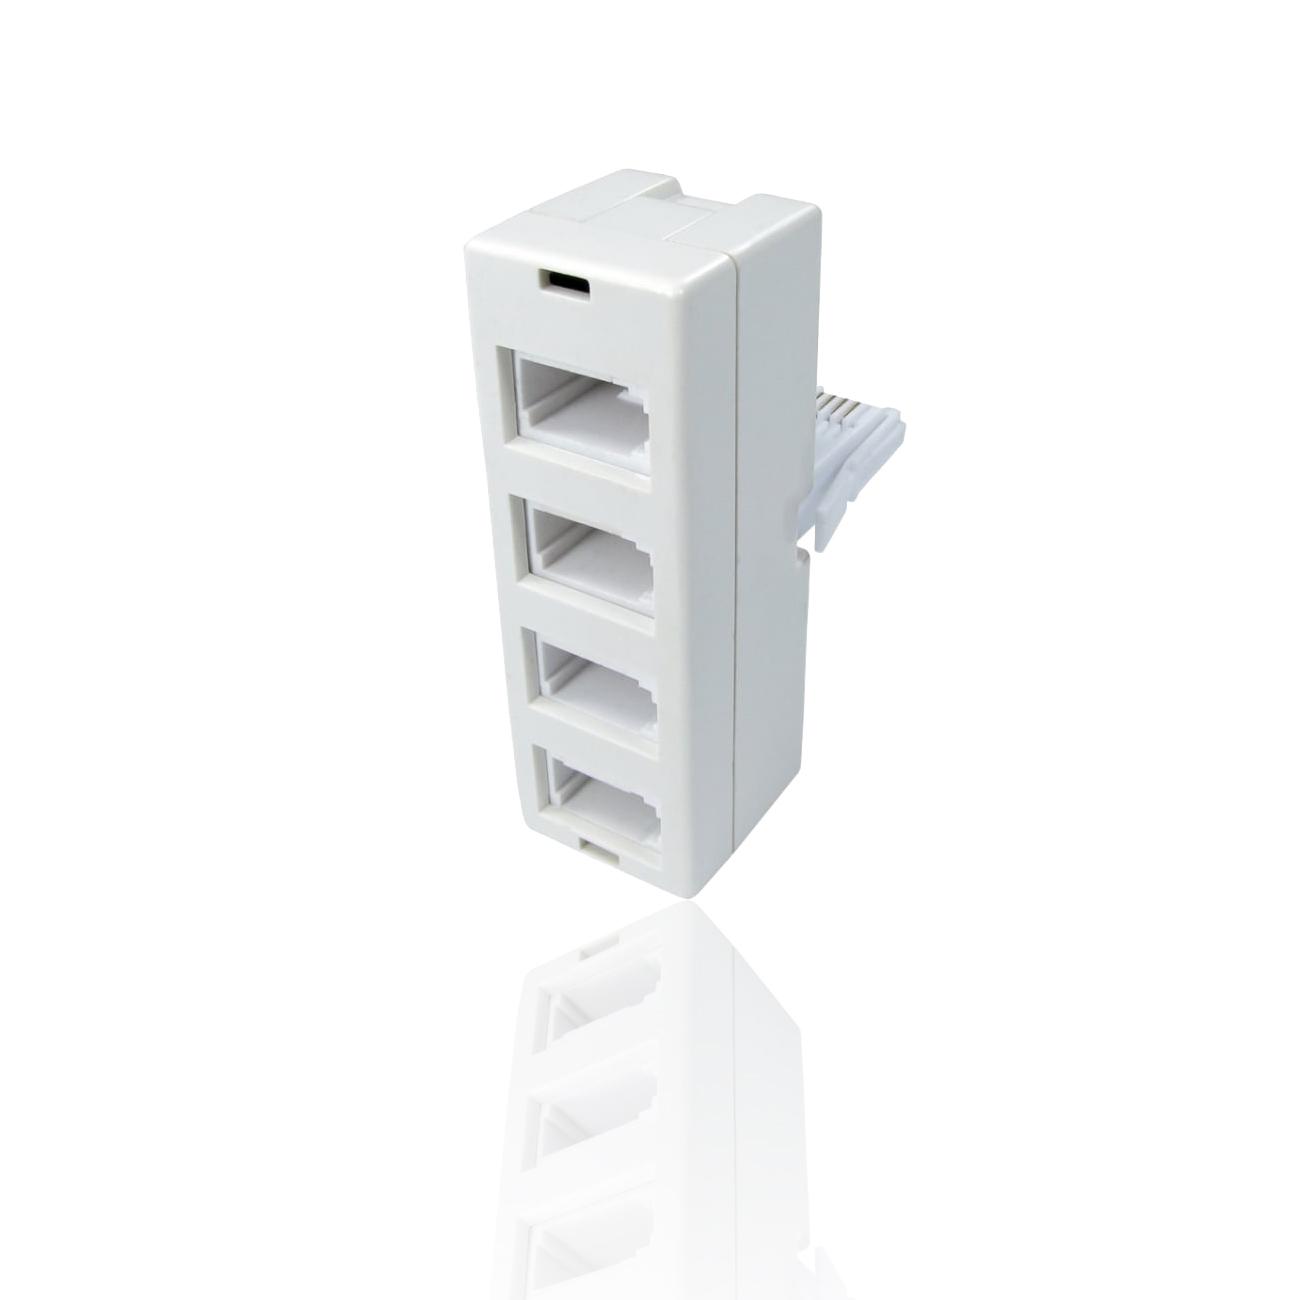 Uk Bt Telephone 4 Way Quad Adapter Splitter Modem Fax 4 X